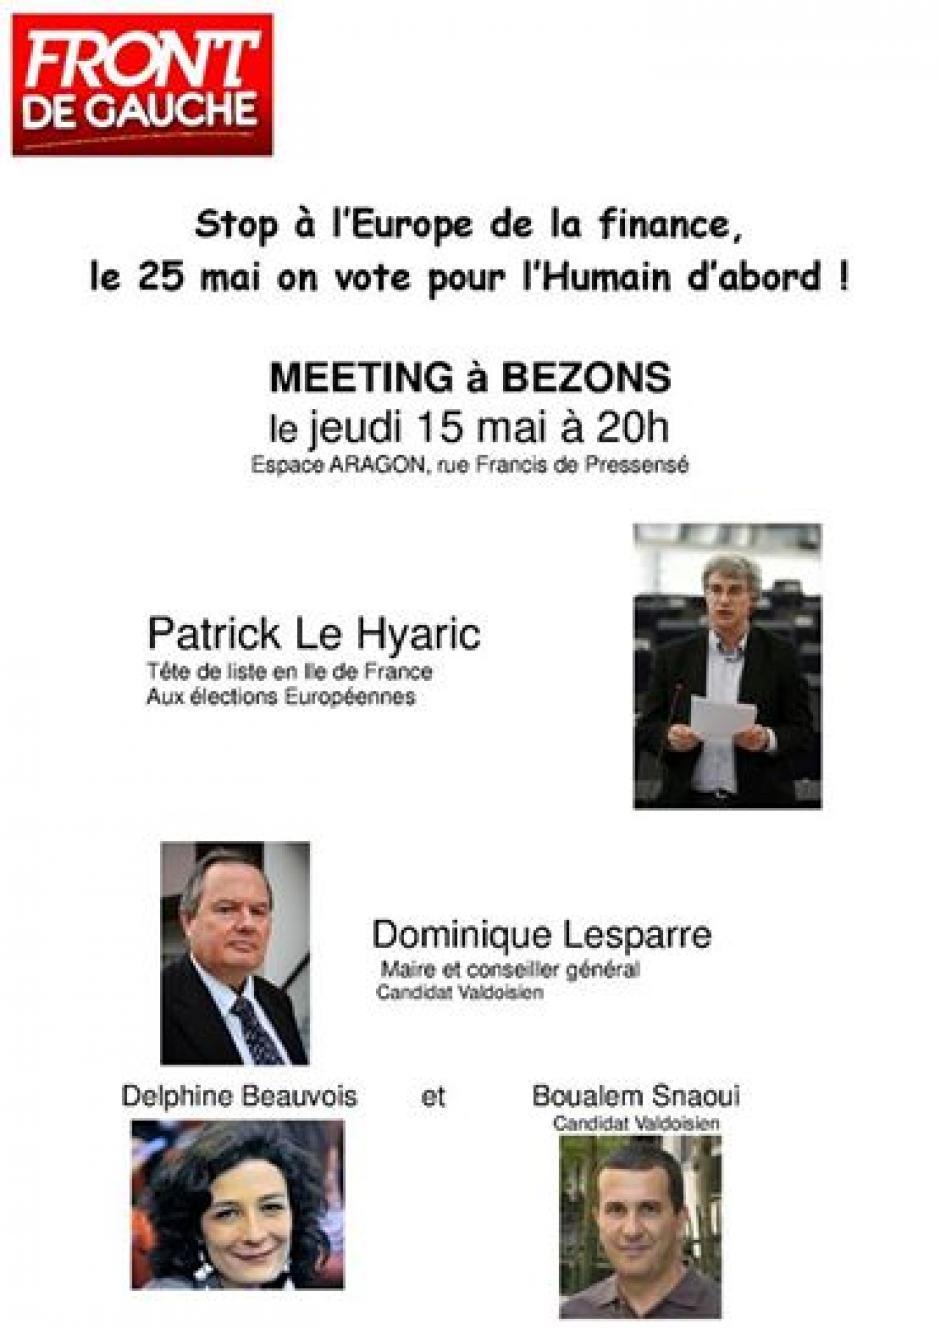 Meeting en présence de Patrick Le Hyaric jeudi 15 mai